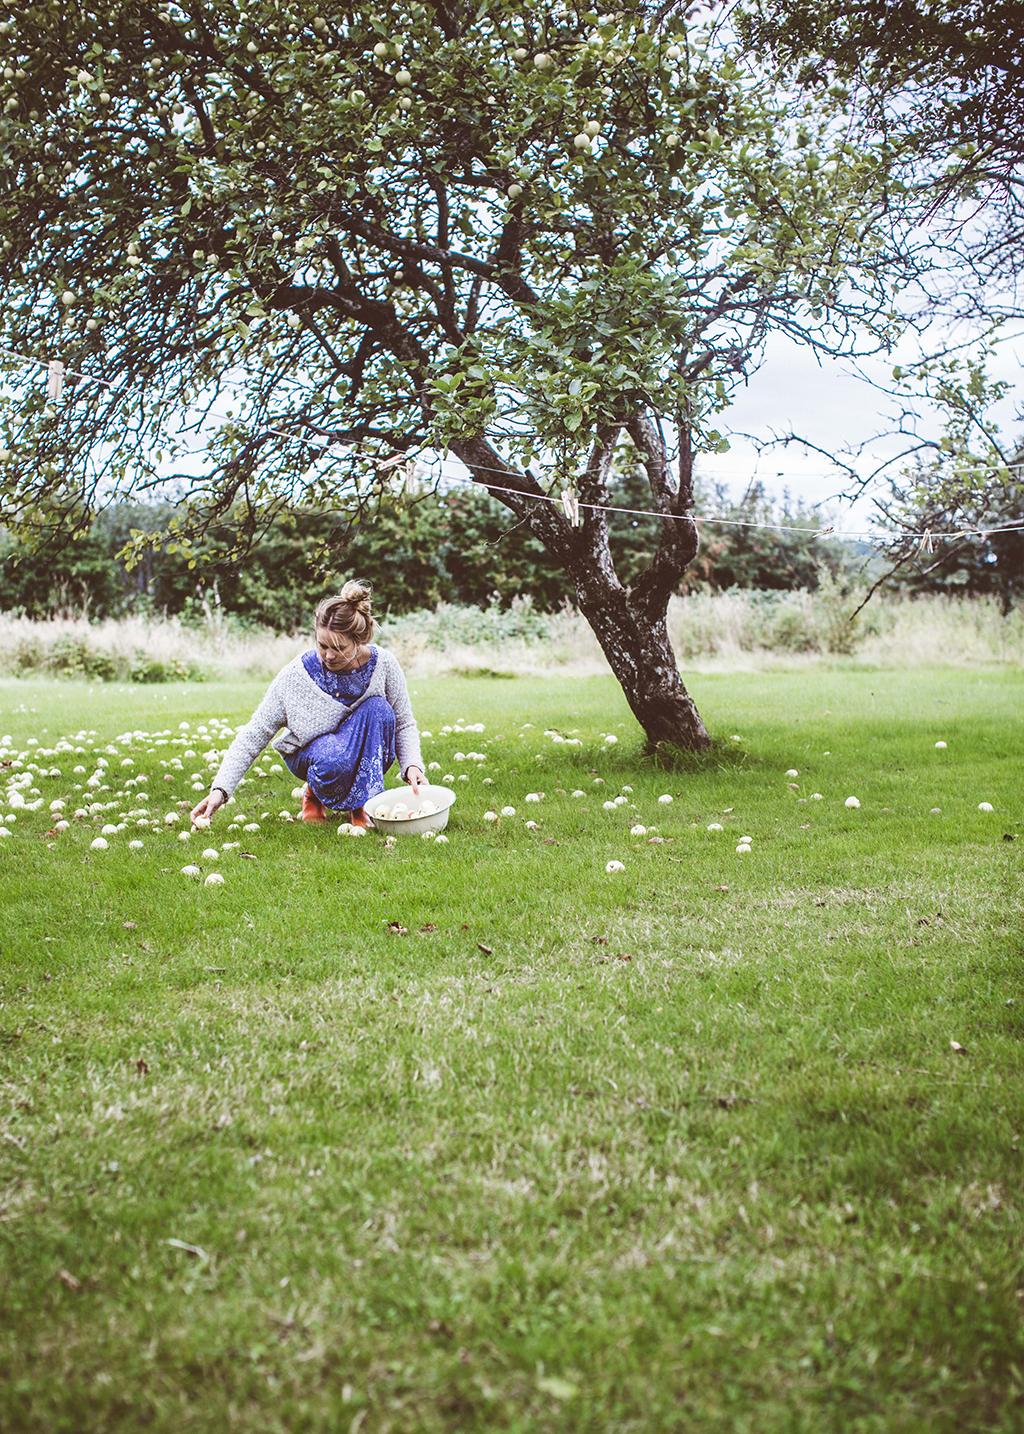 Lovelylife_apples_krickelin-8331-1